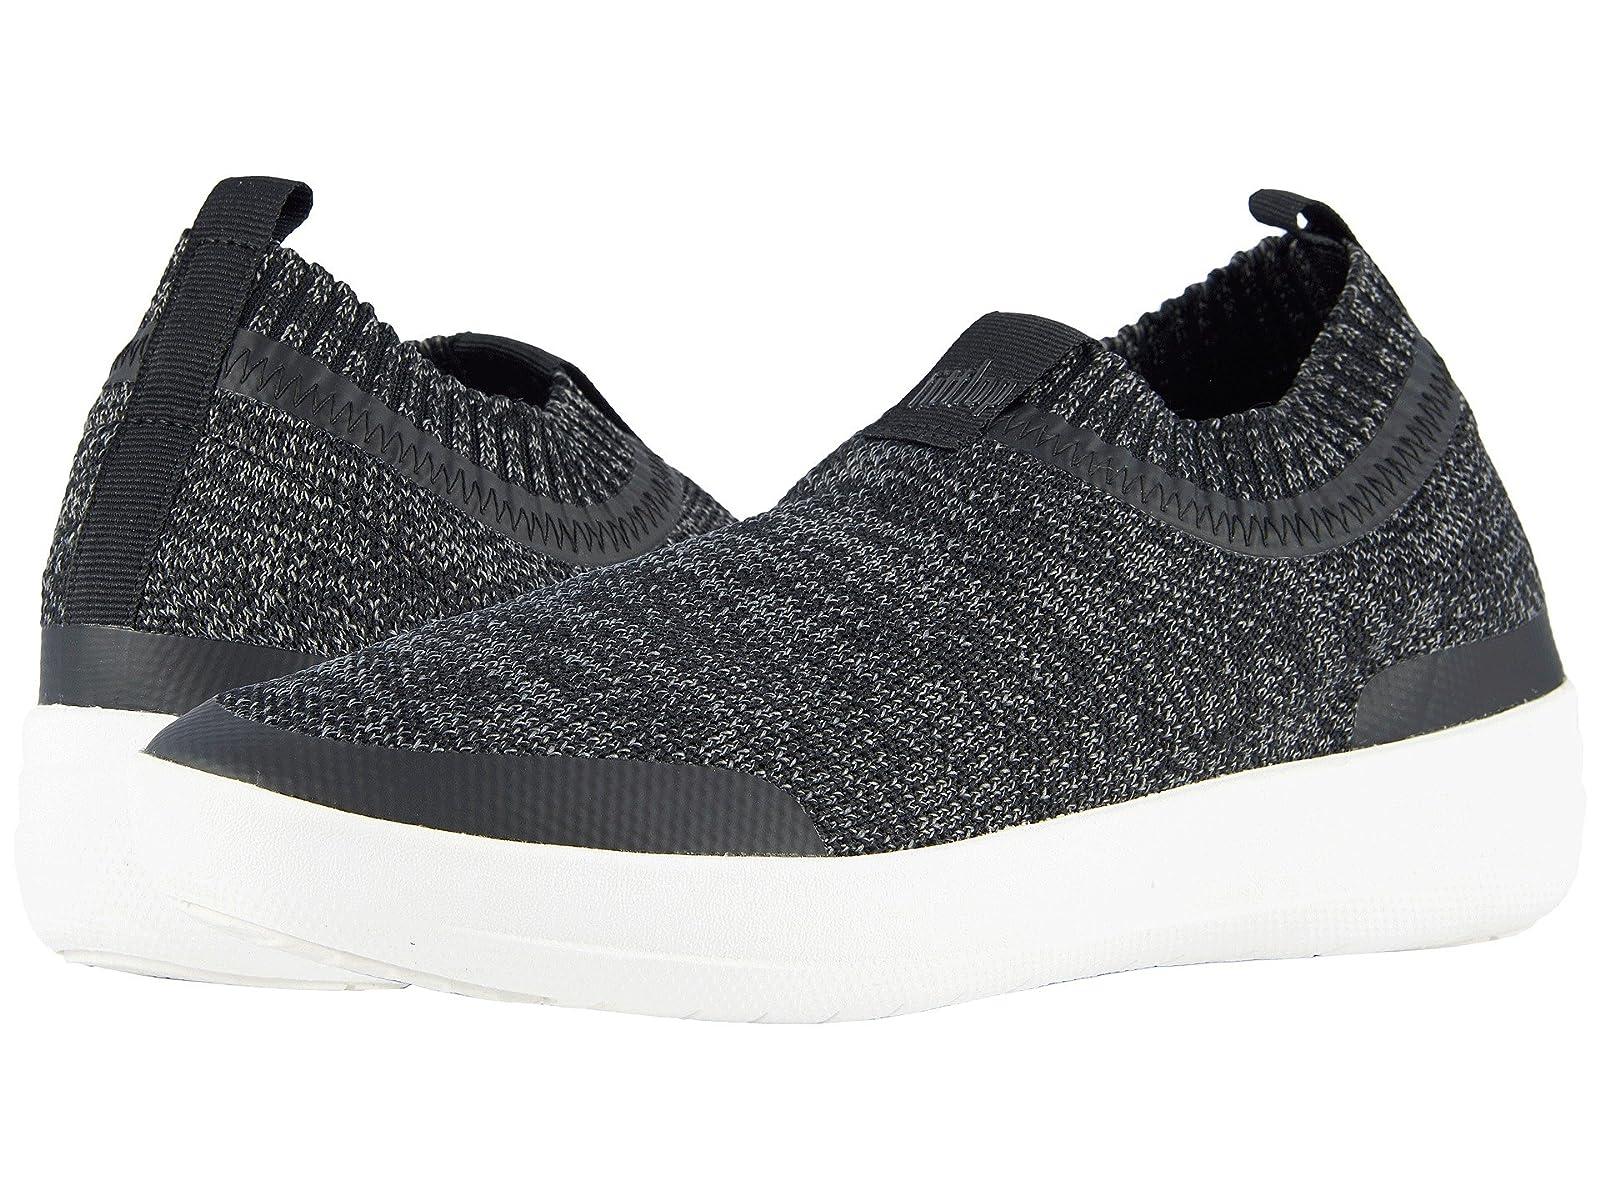 FitFlop Uberknit Slip-On SneakersAtmospheric grades have affordable shoes